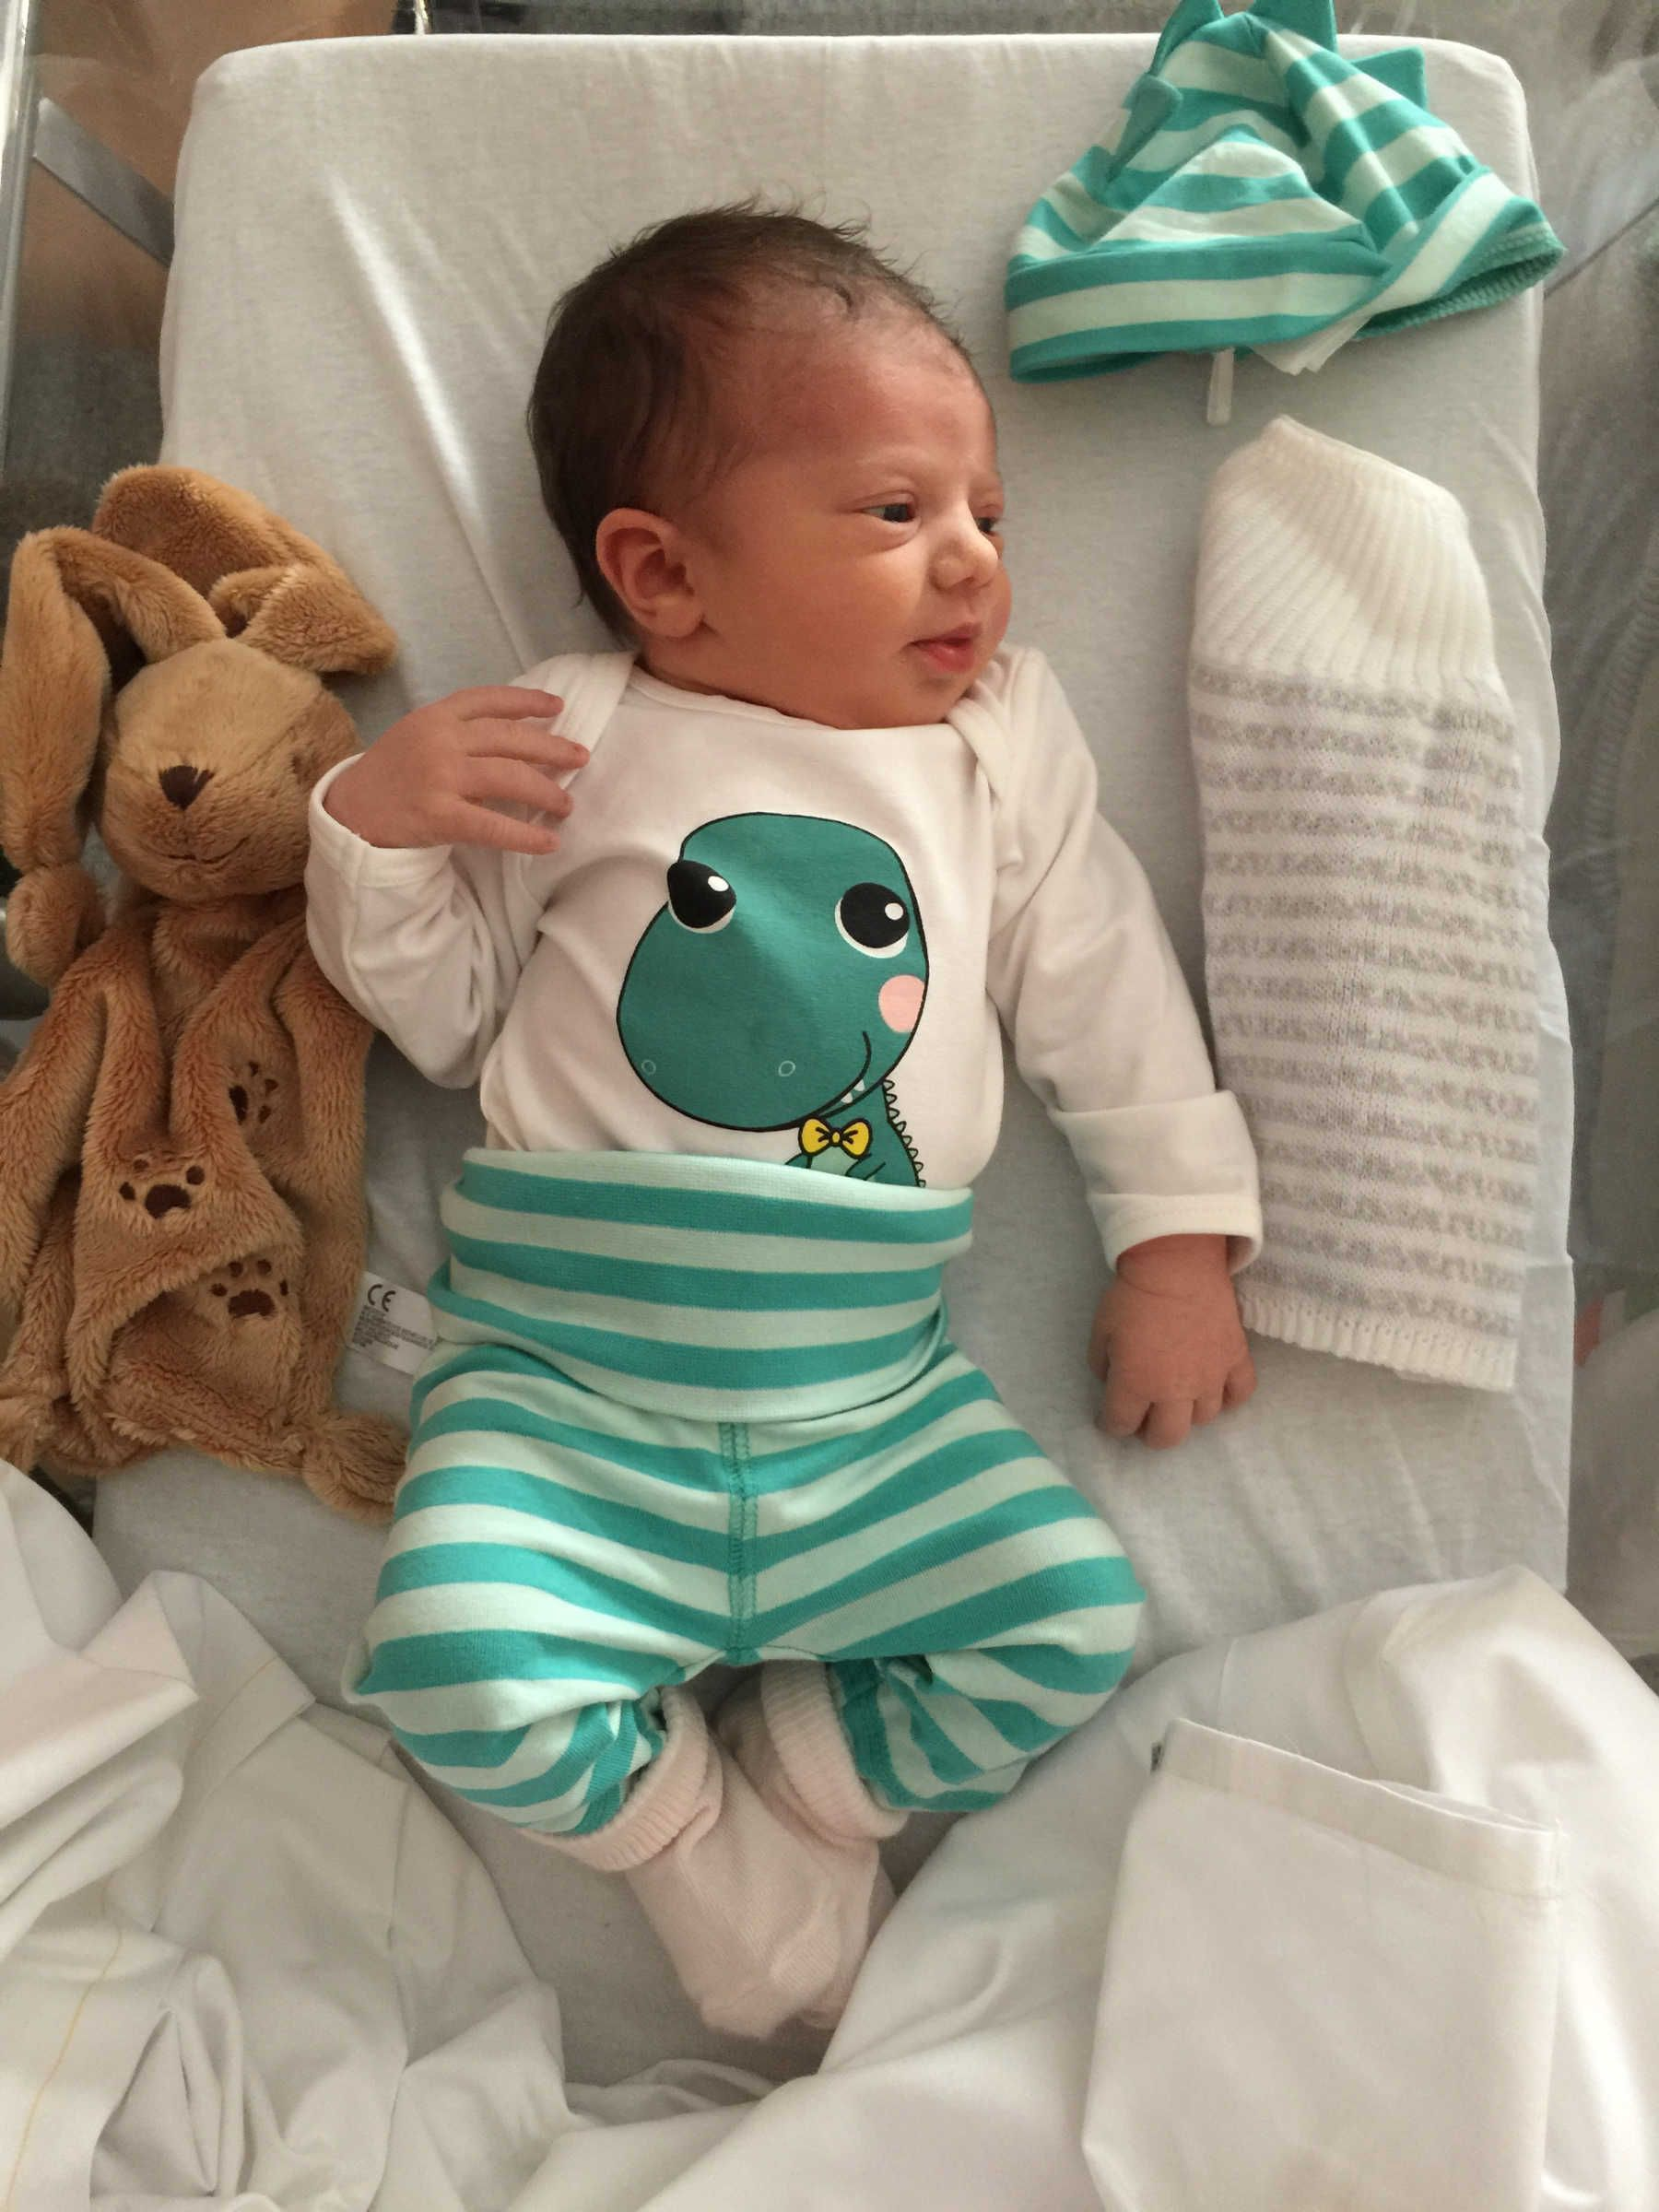 Luyana's birth story